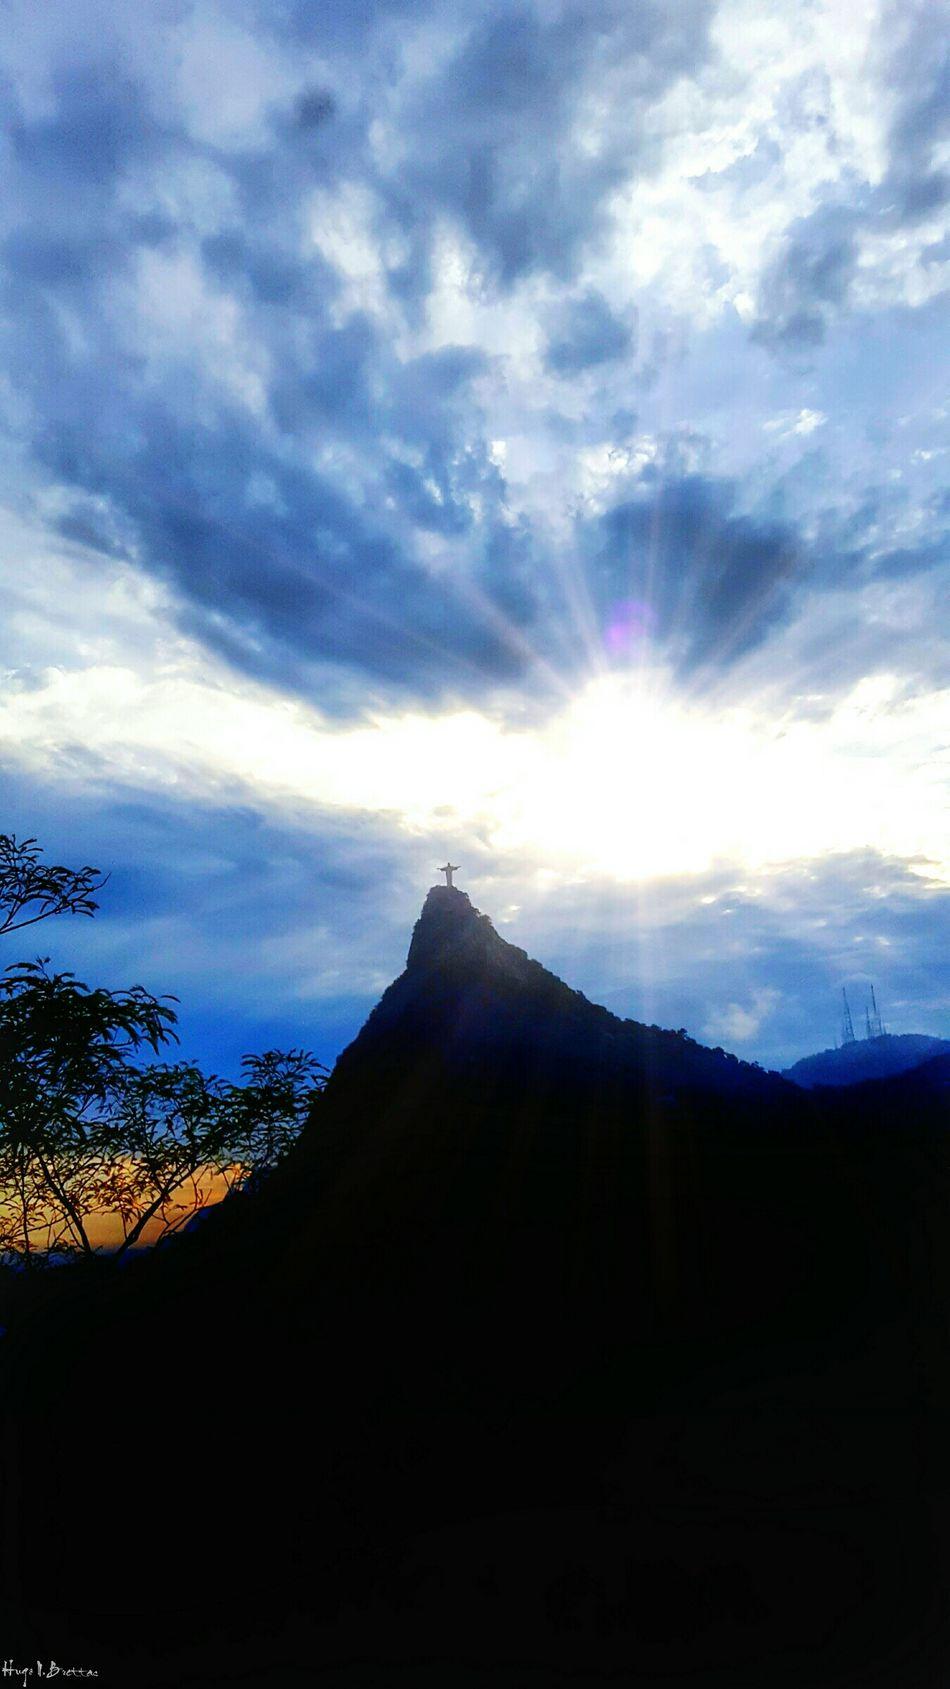 Landscape Cloud - Sky Scenics Beauty In Nature Nature No People Outdoors Sky Mountain Day Christ Redeemer Christ Redemptor Riodejaneiro Rio De Janeiro Brazil